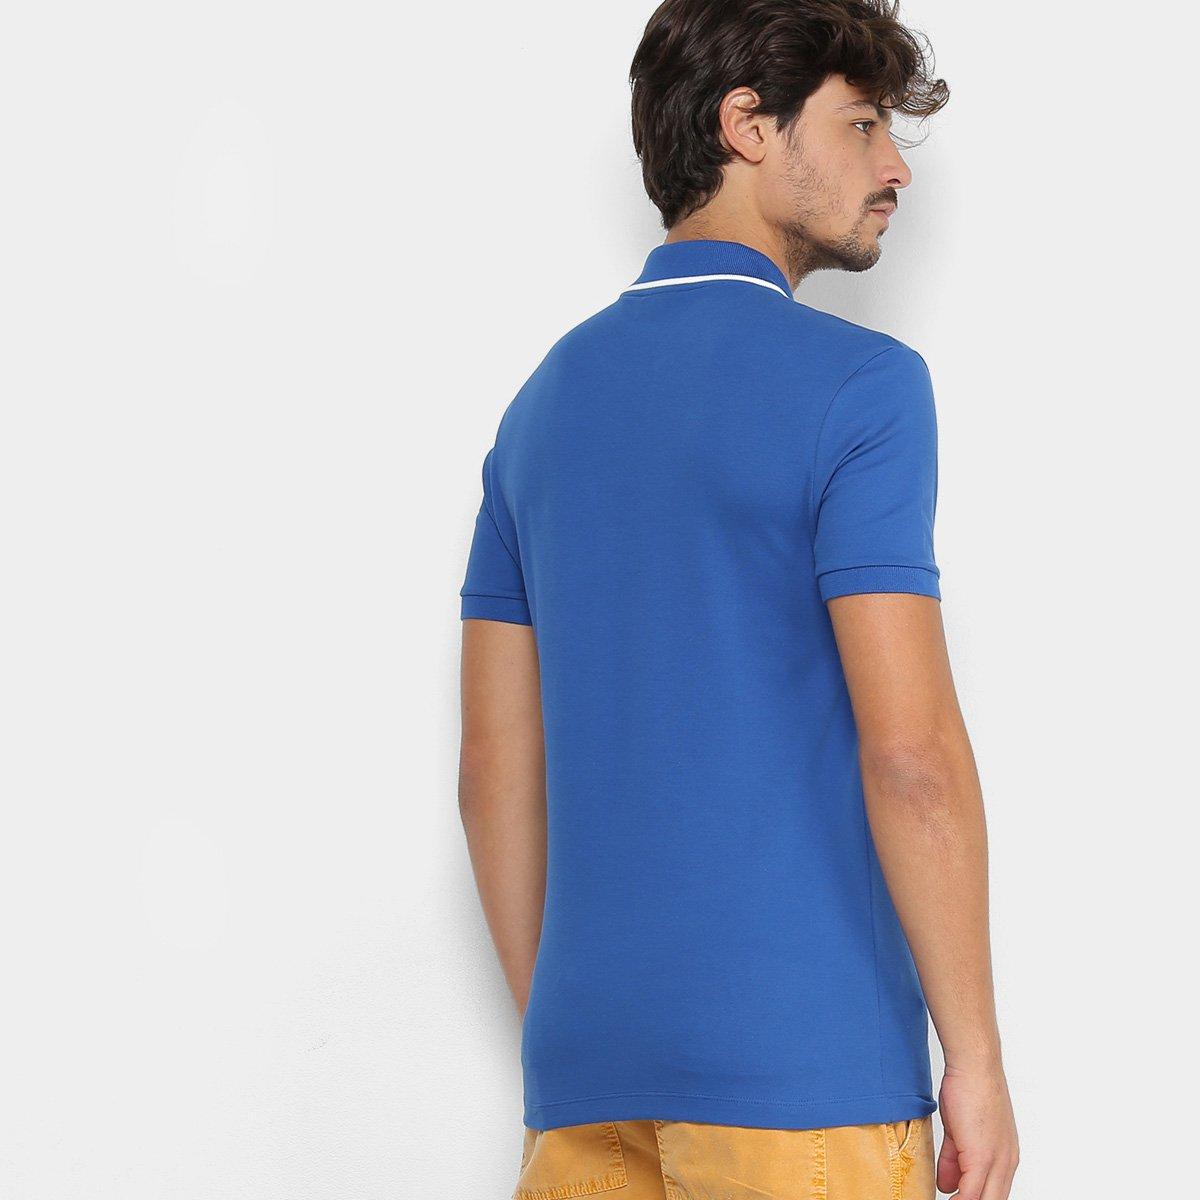 b332790e25 ... Camisa Polo Lacoste Slim Fit Algodão Pima Elastano Masculina ...